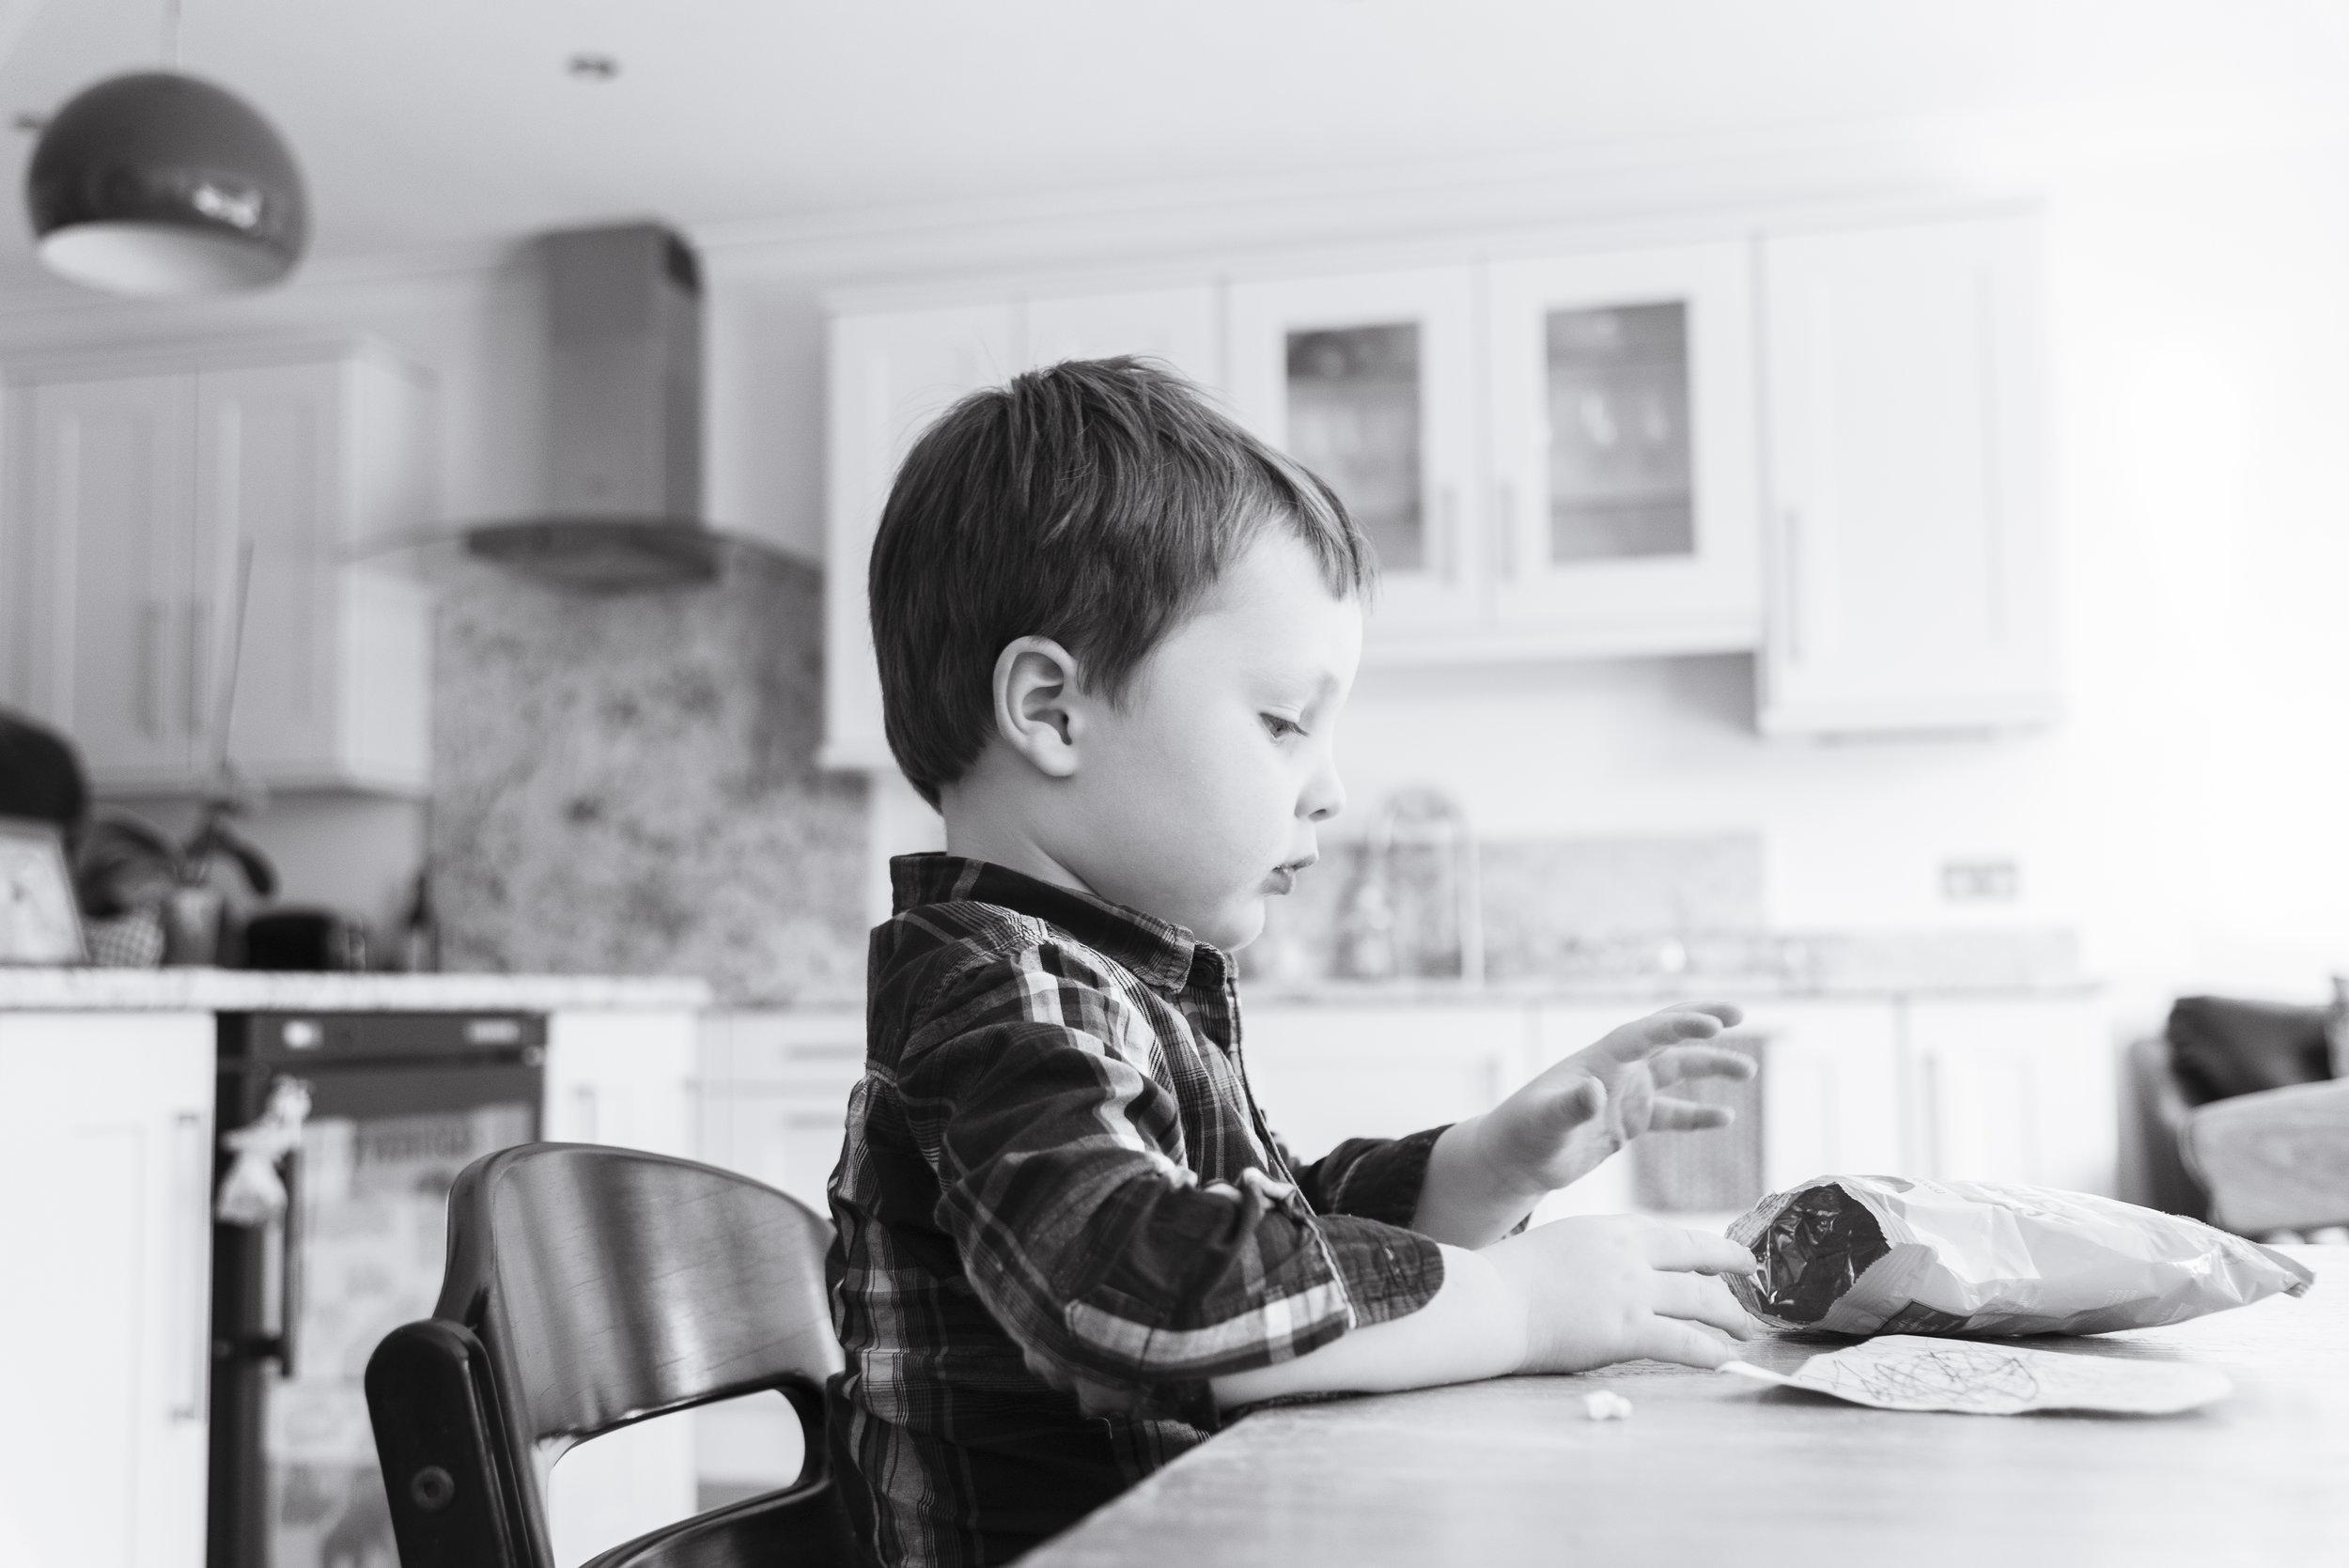 sally-hornung-photography-boy-crisps-1.jpg